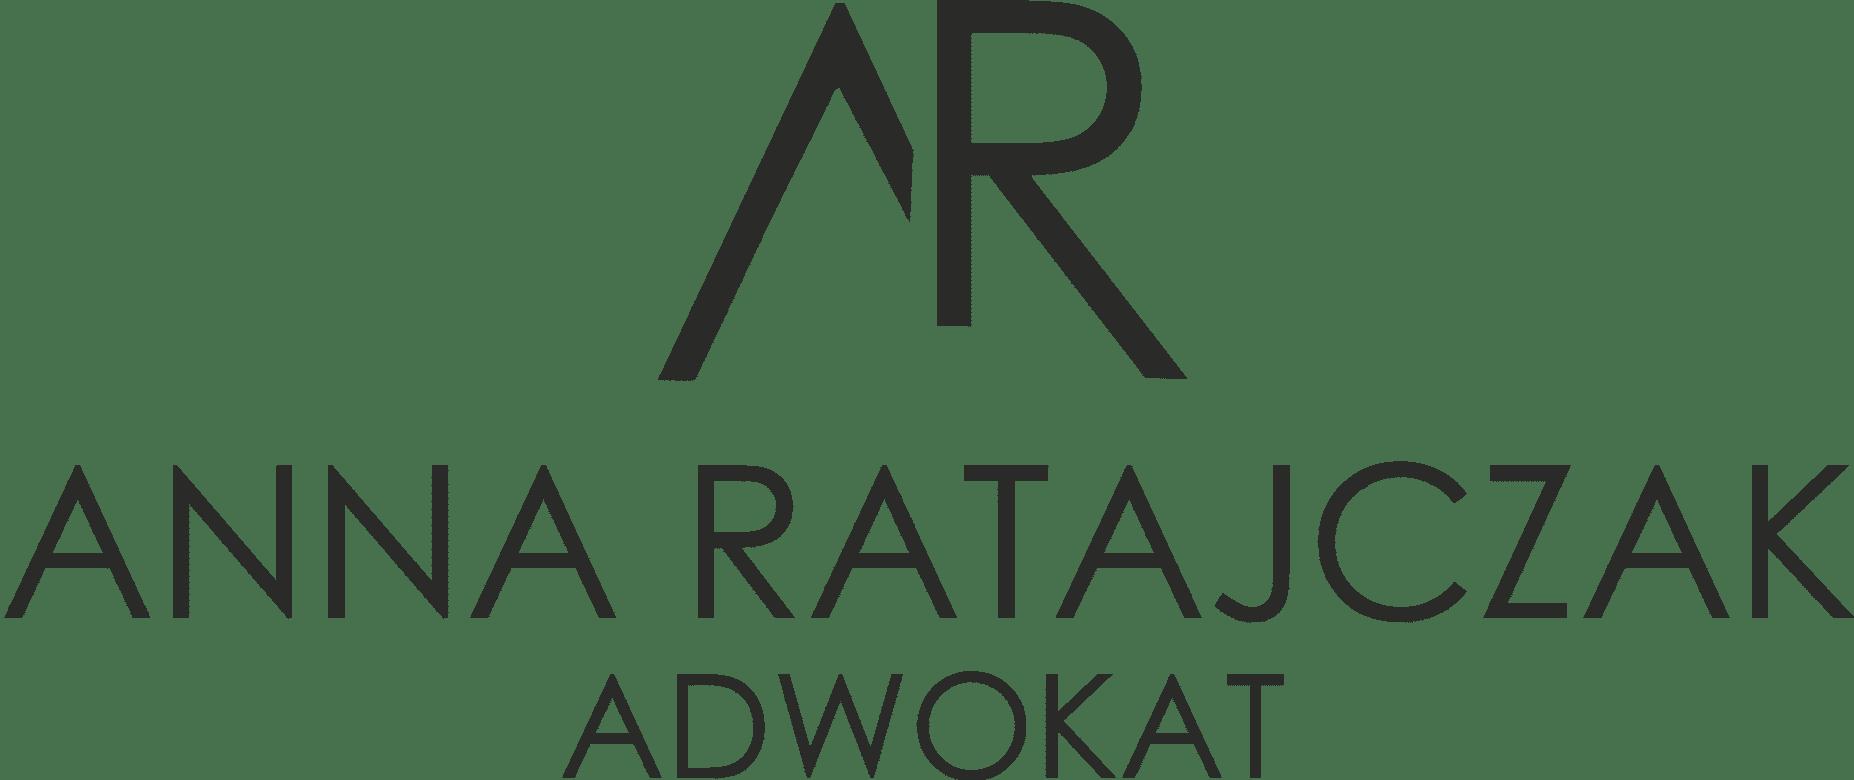 Kancelaria adwokacka: Anna Ratajczak